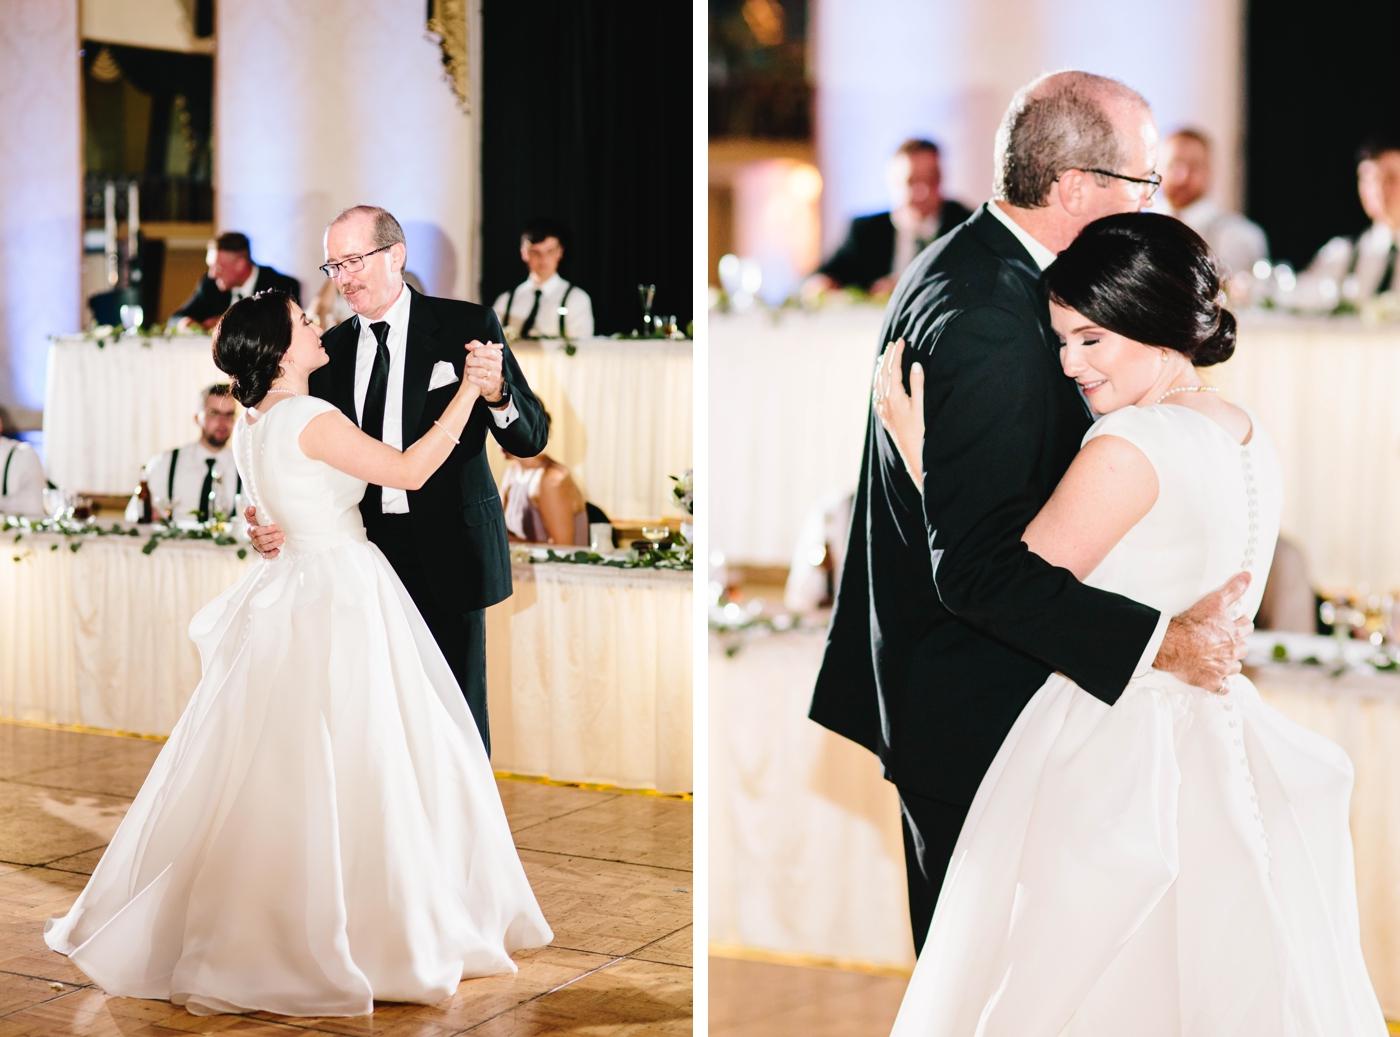 chicago-fine-art-wedding-photography-mccarthy64